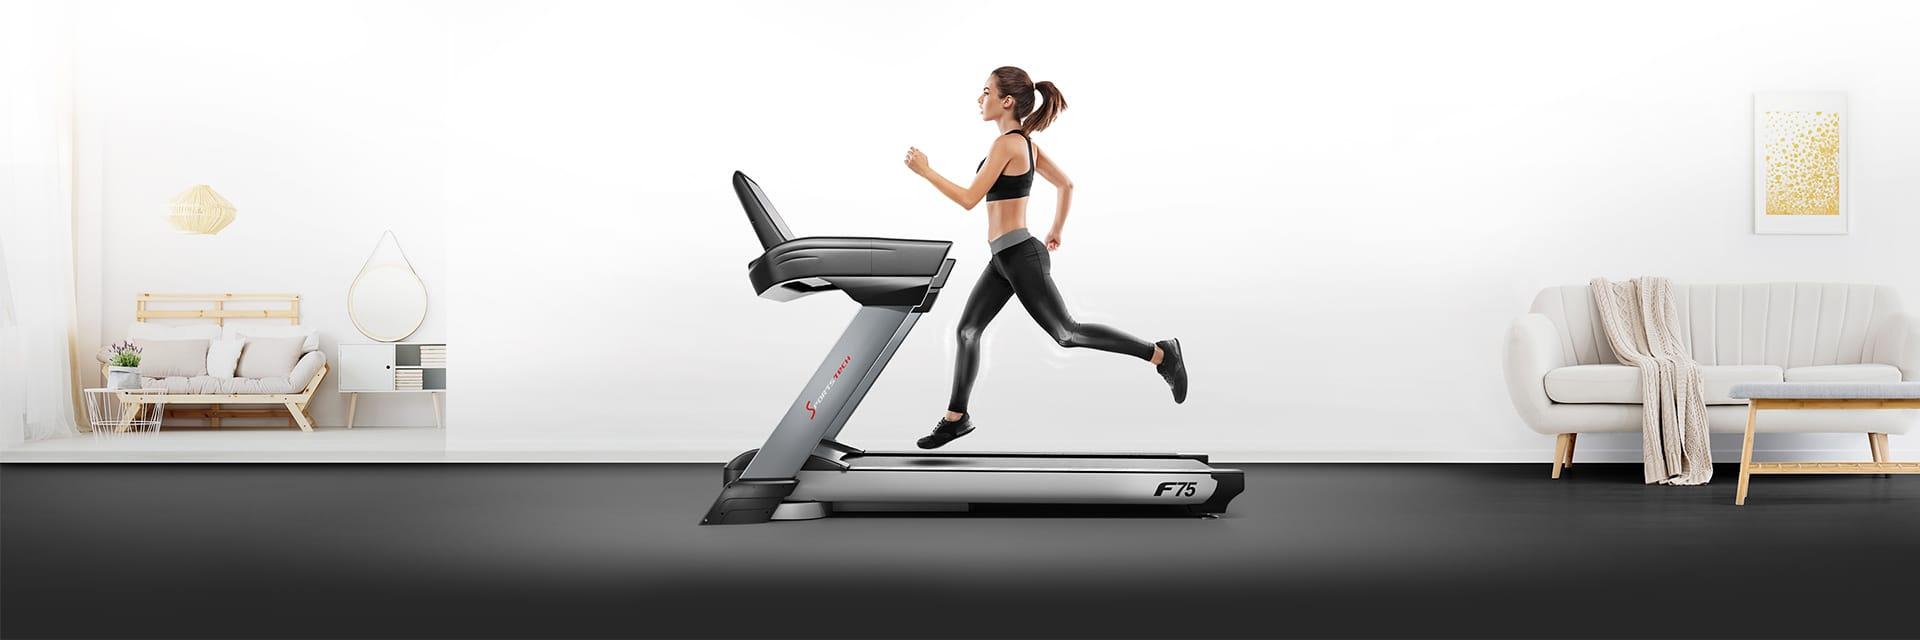 f75-cardio-workut